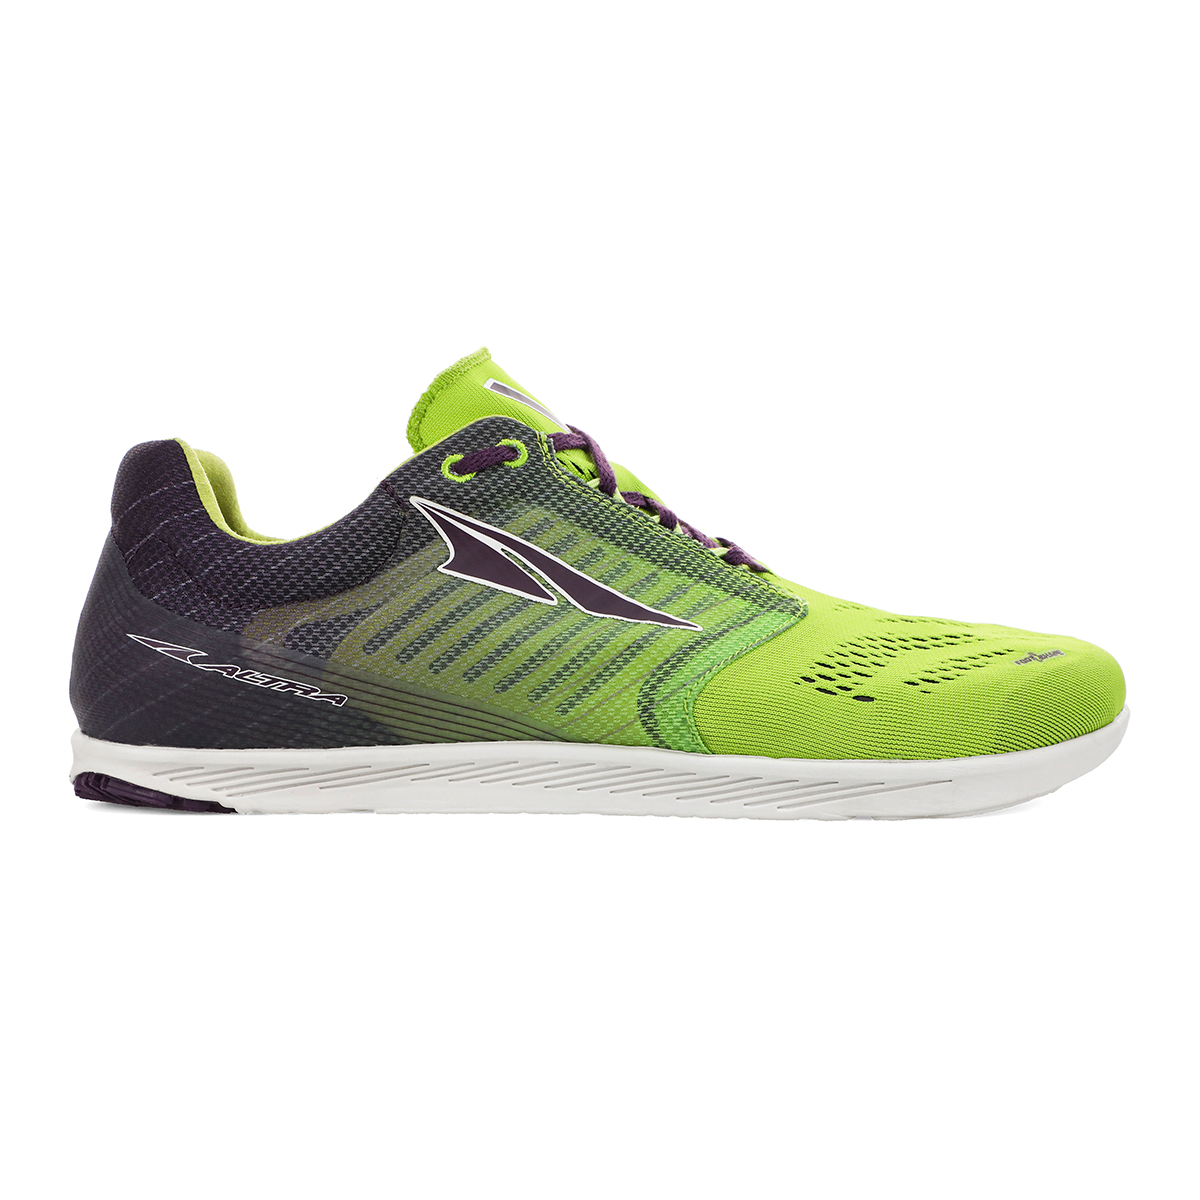 Altra Vanish R Running Shoe - Color: Macaw Green/Purple - Size: M4/W5.5 - Width: Regular, Macaw Green/Purple, large, image 1